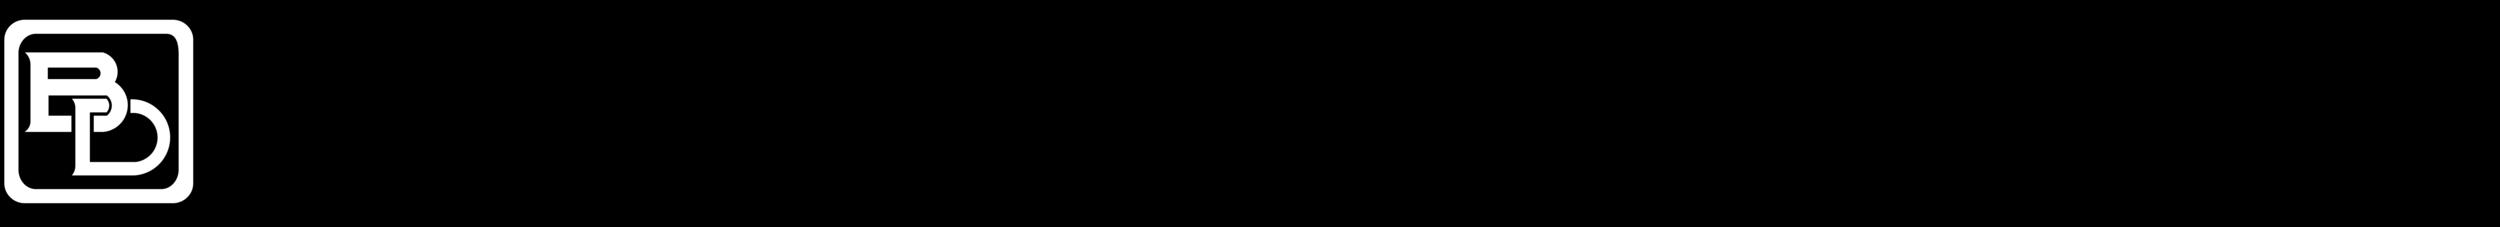 Baskerville Donovan, Inc. Logo